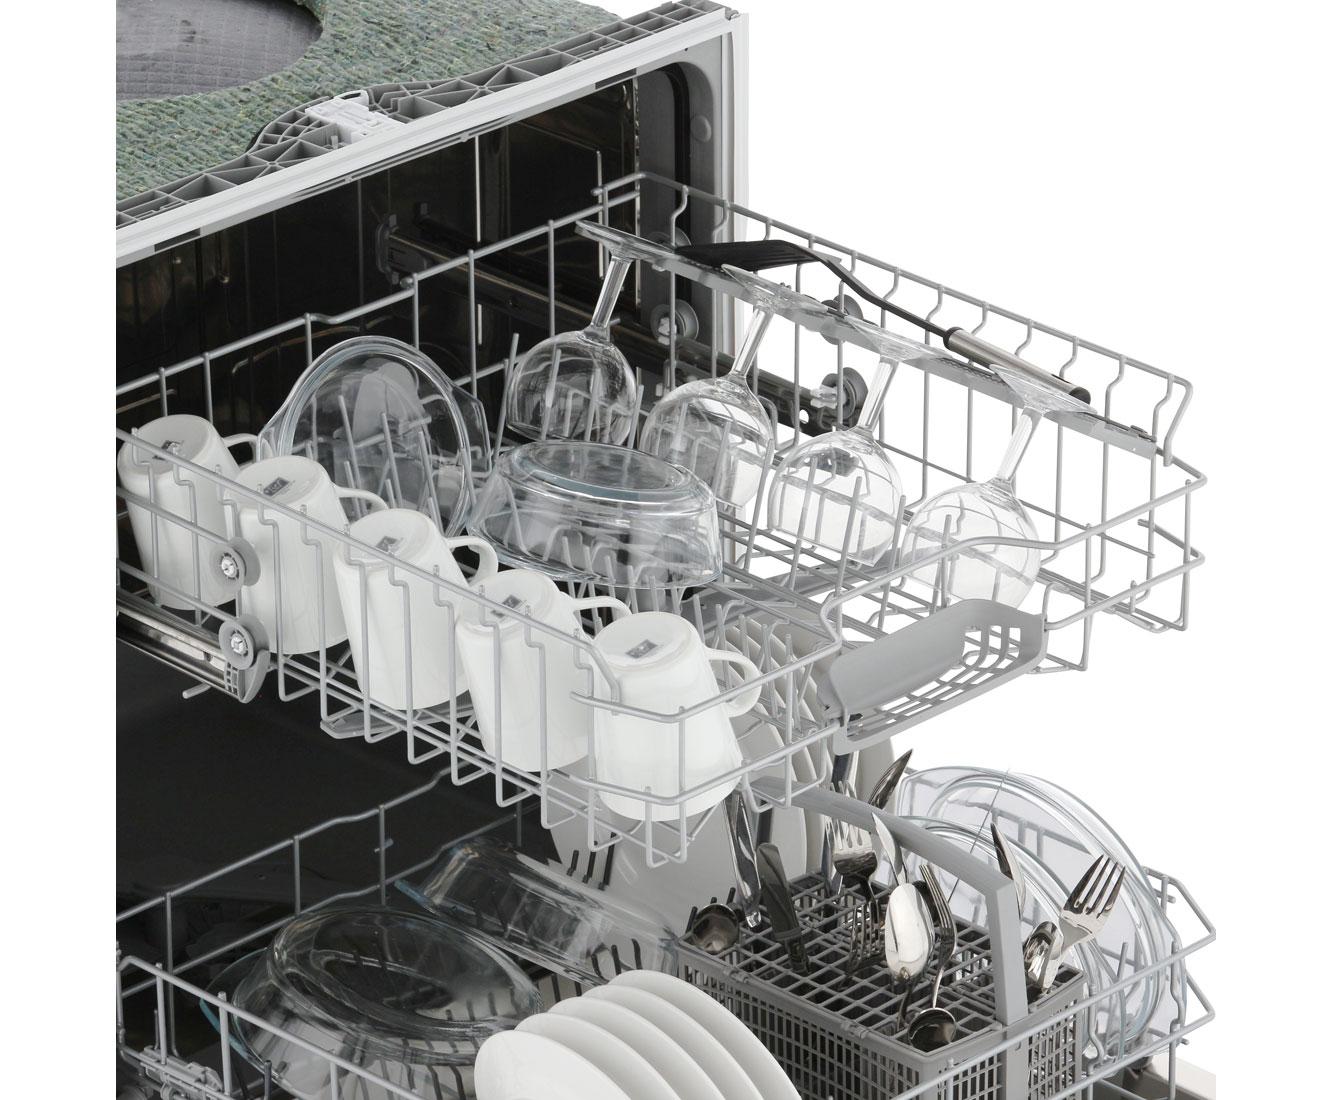 Vollintegrierte Spulmaschine Siemens Sn658x02pd Extraklasse